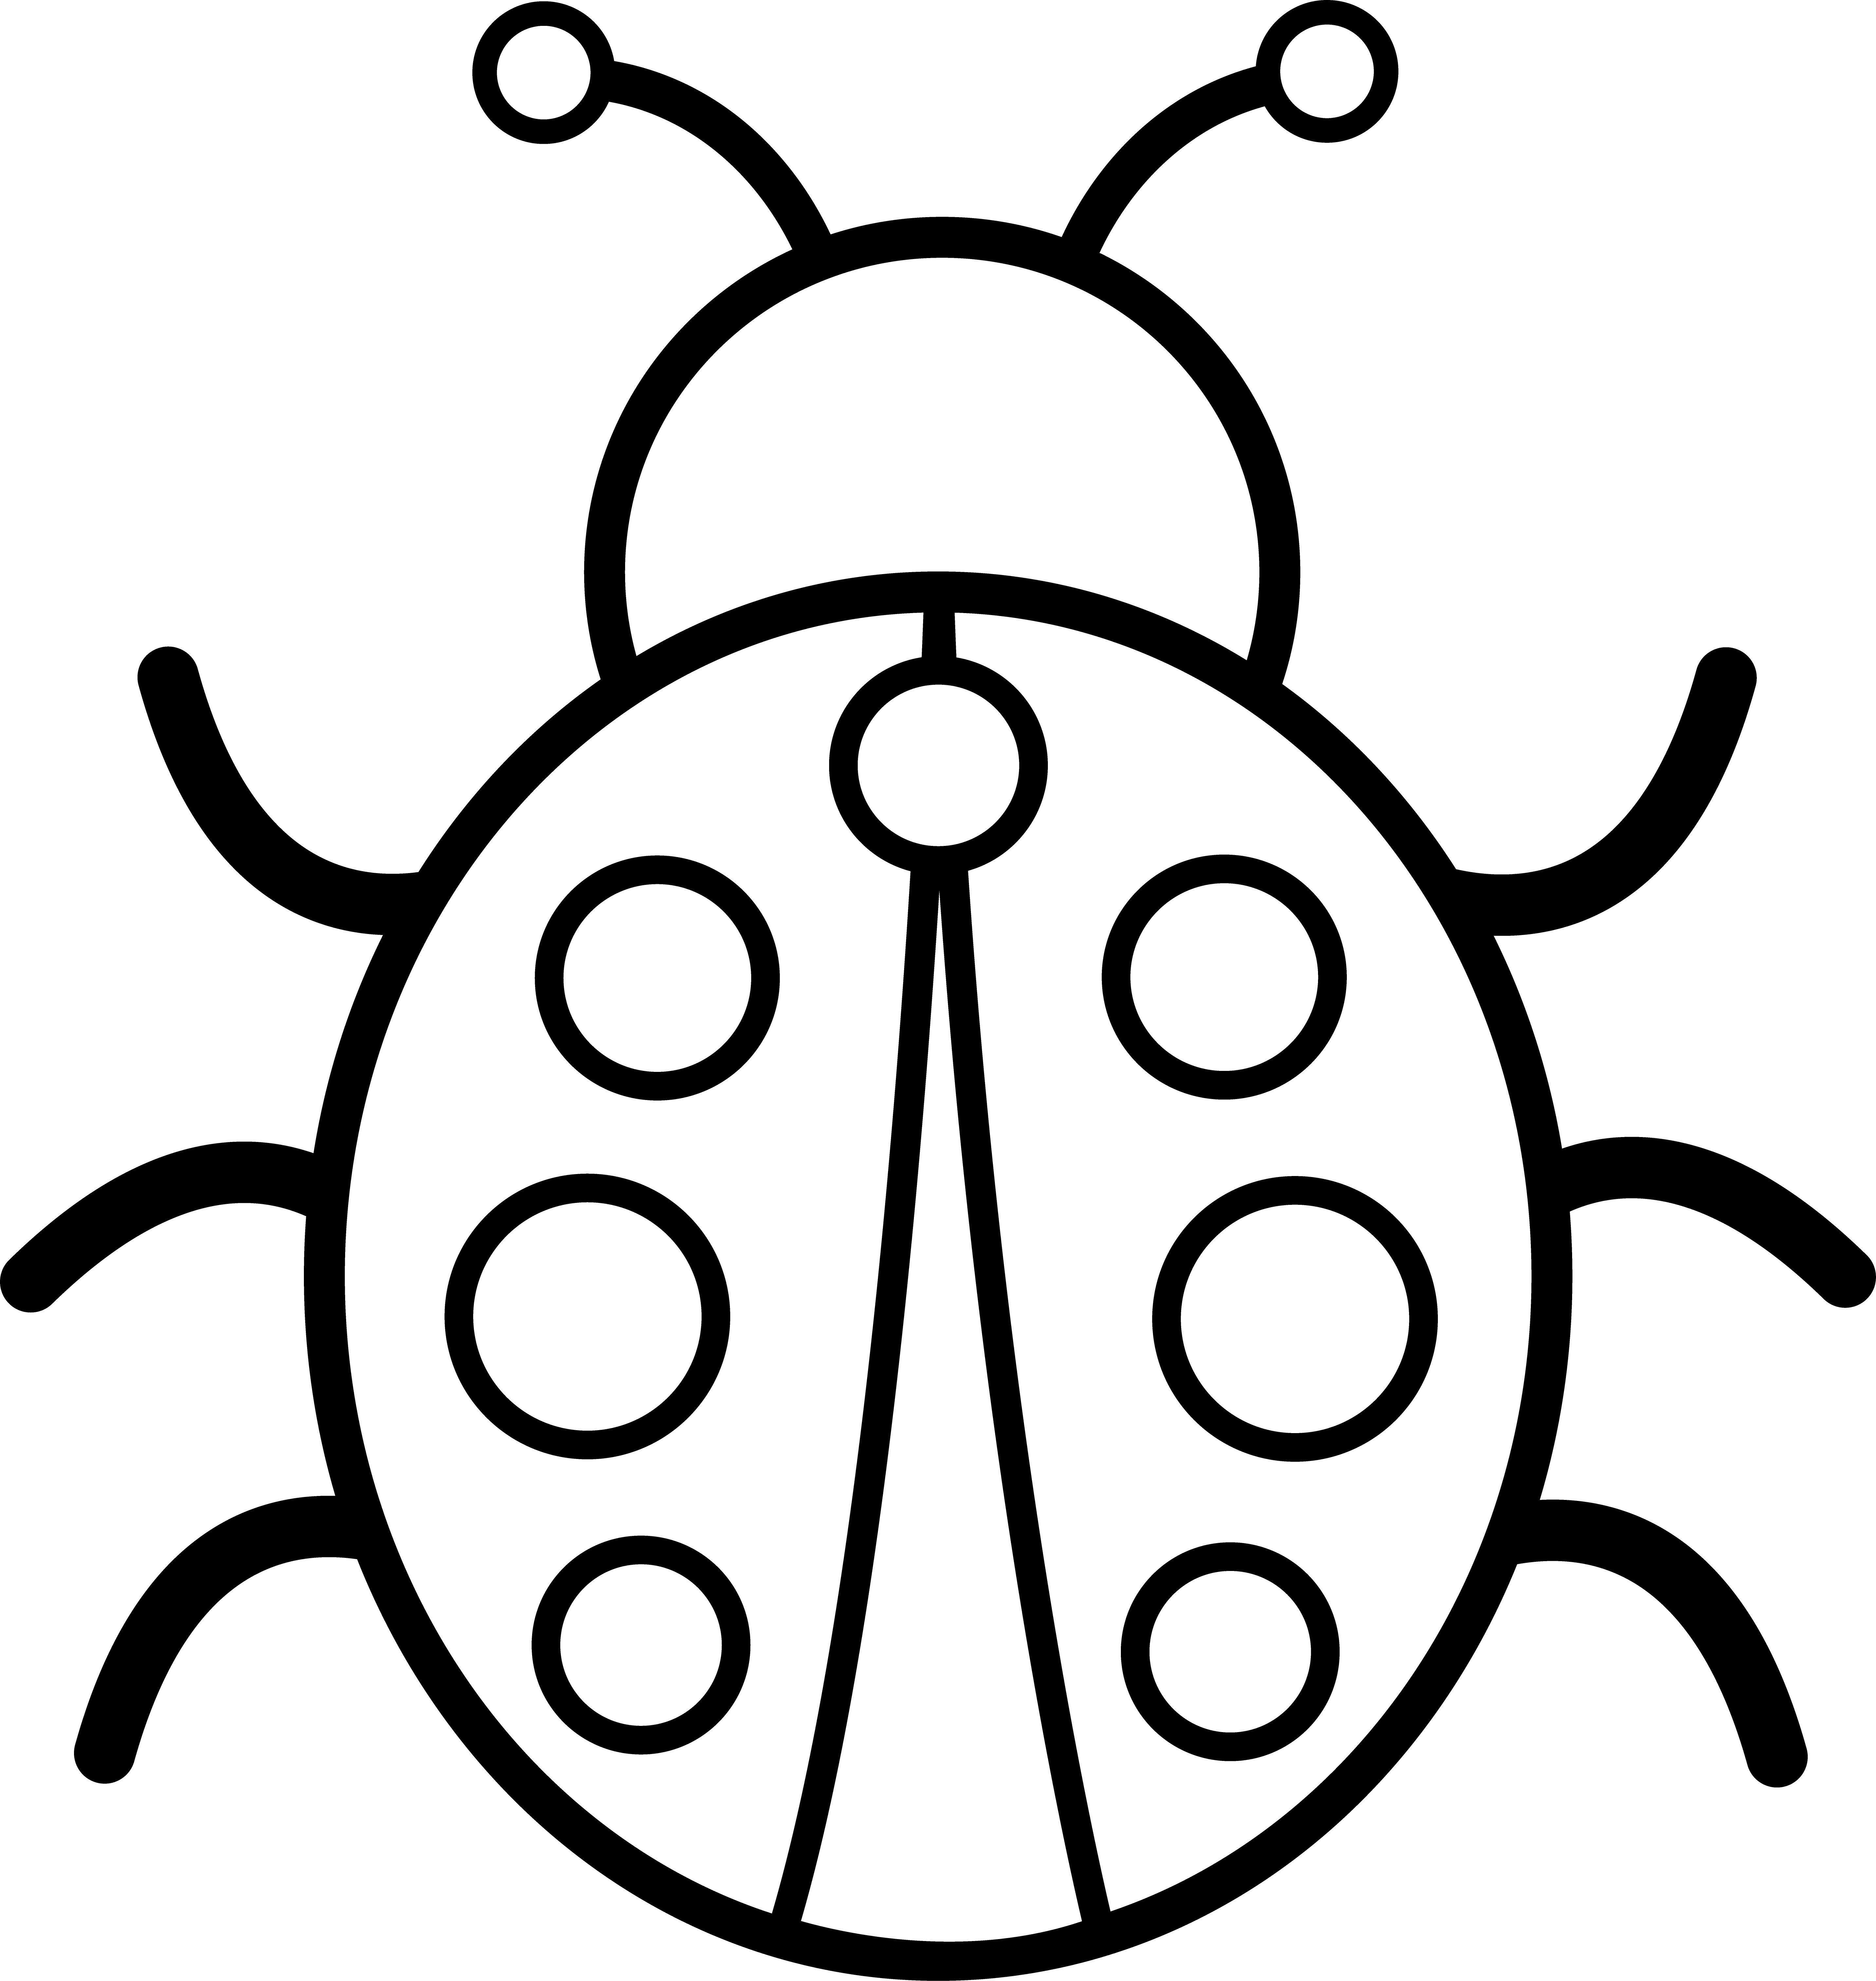 SCAL SVG Ladybug Ladybug coloring page Bug coloring